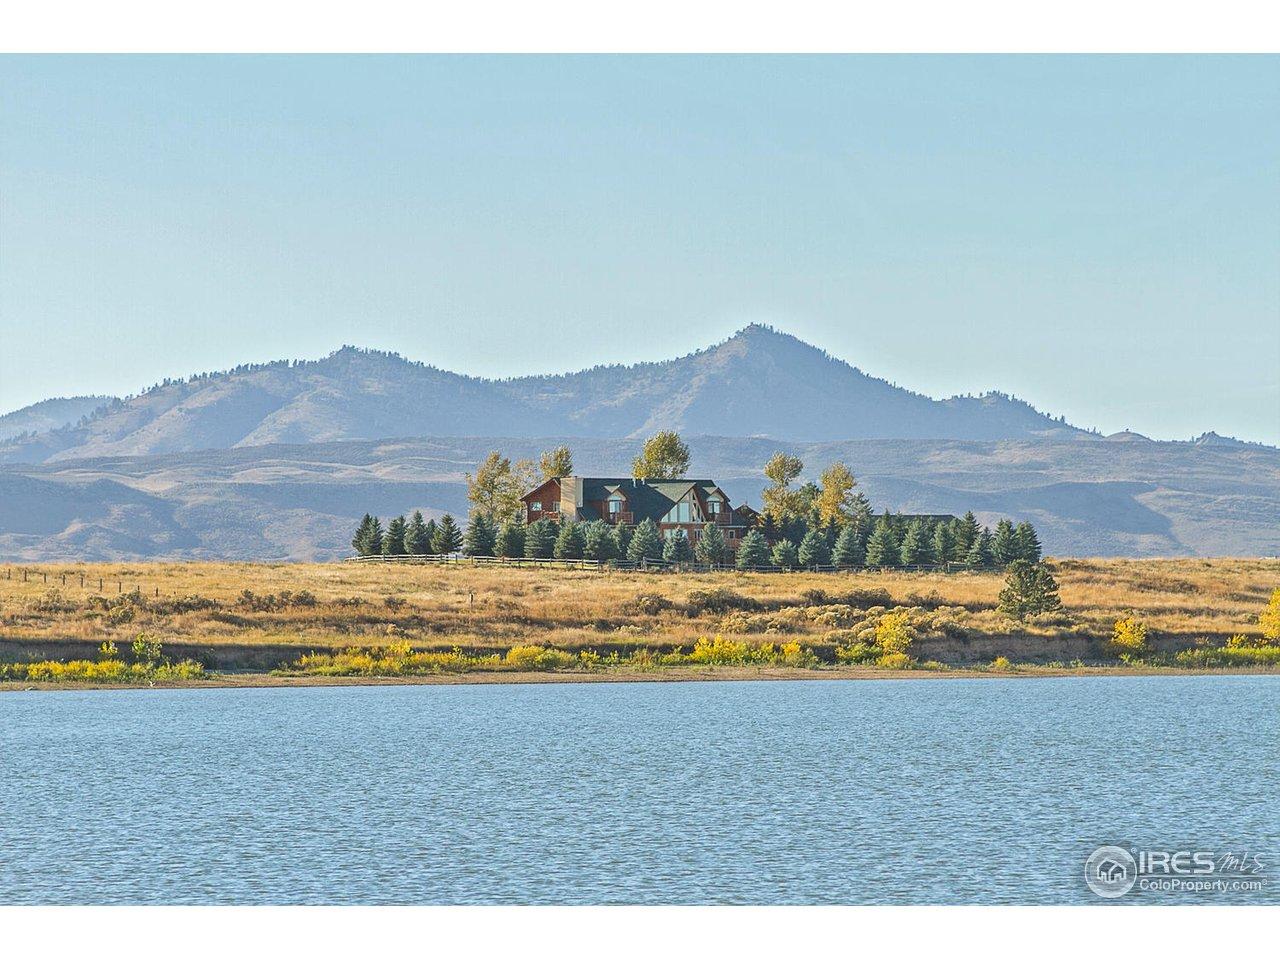 7426 Douglass Lake Ranch Rd, Fort Collins CO 80524